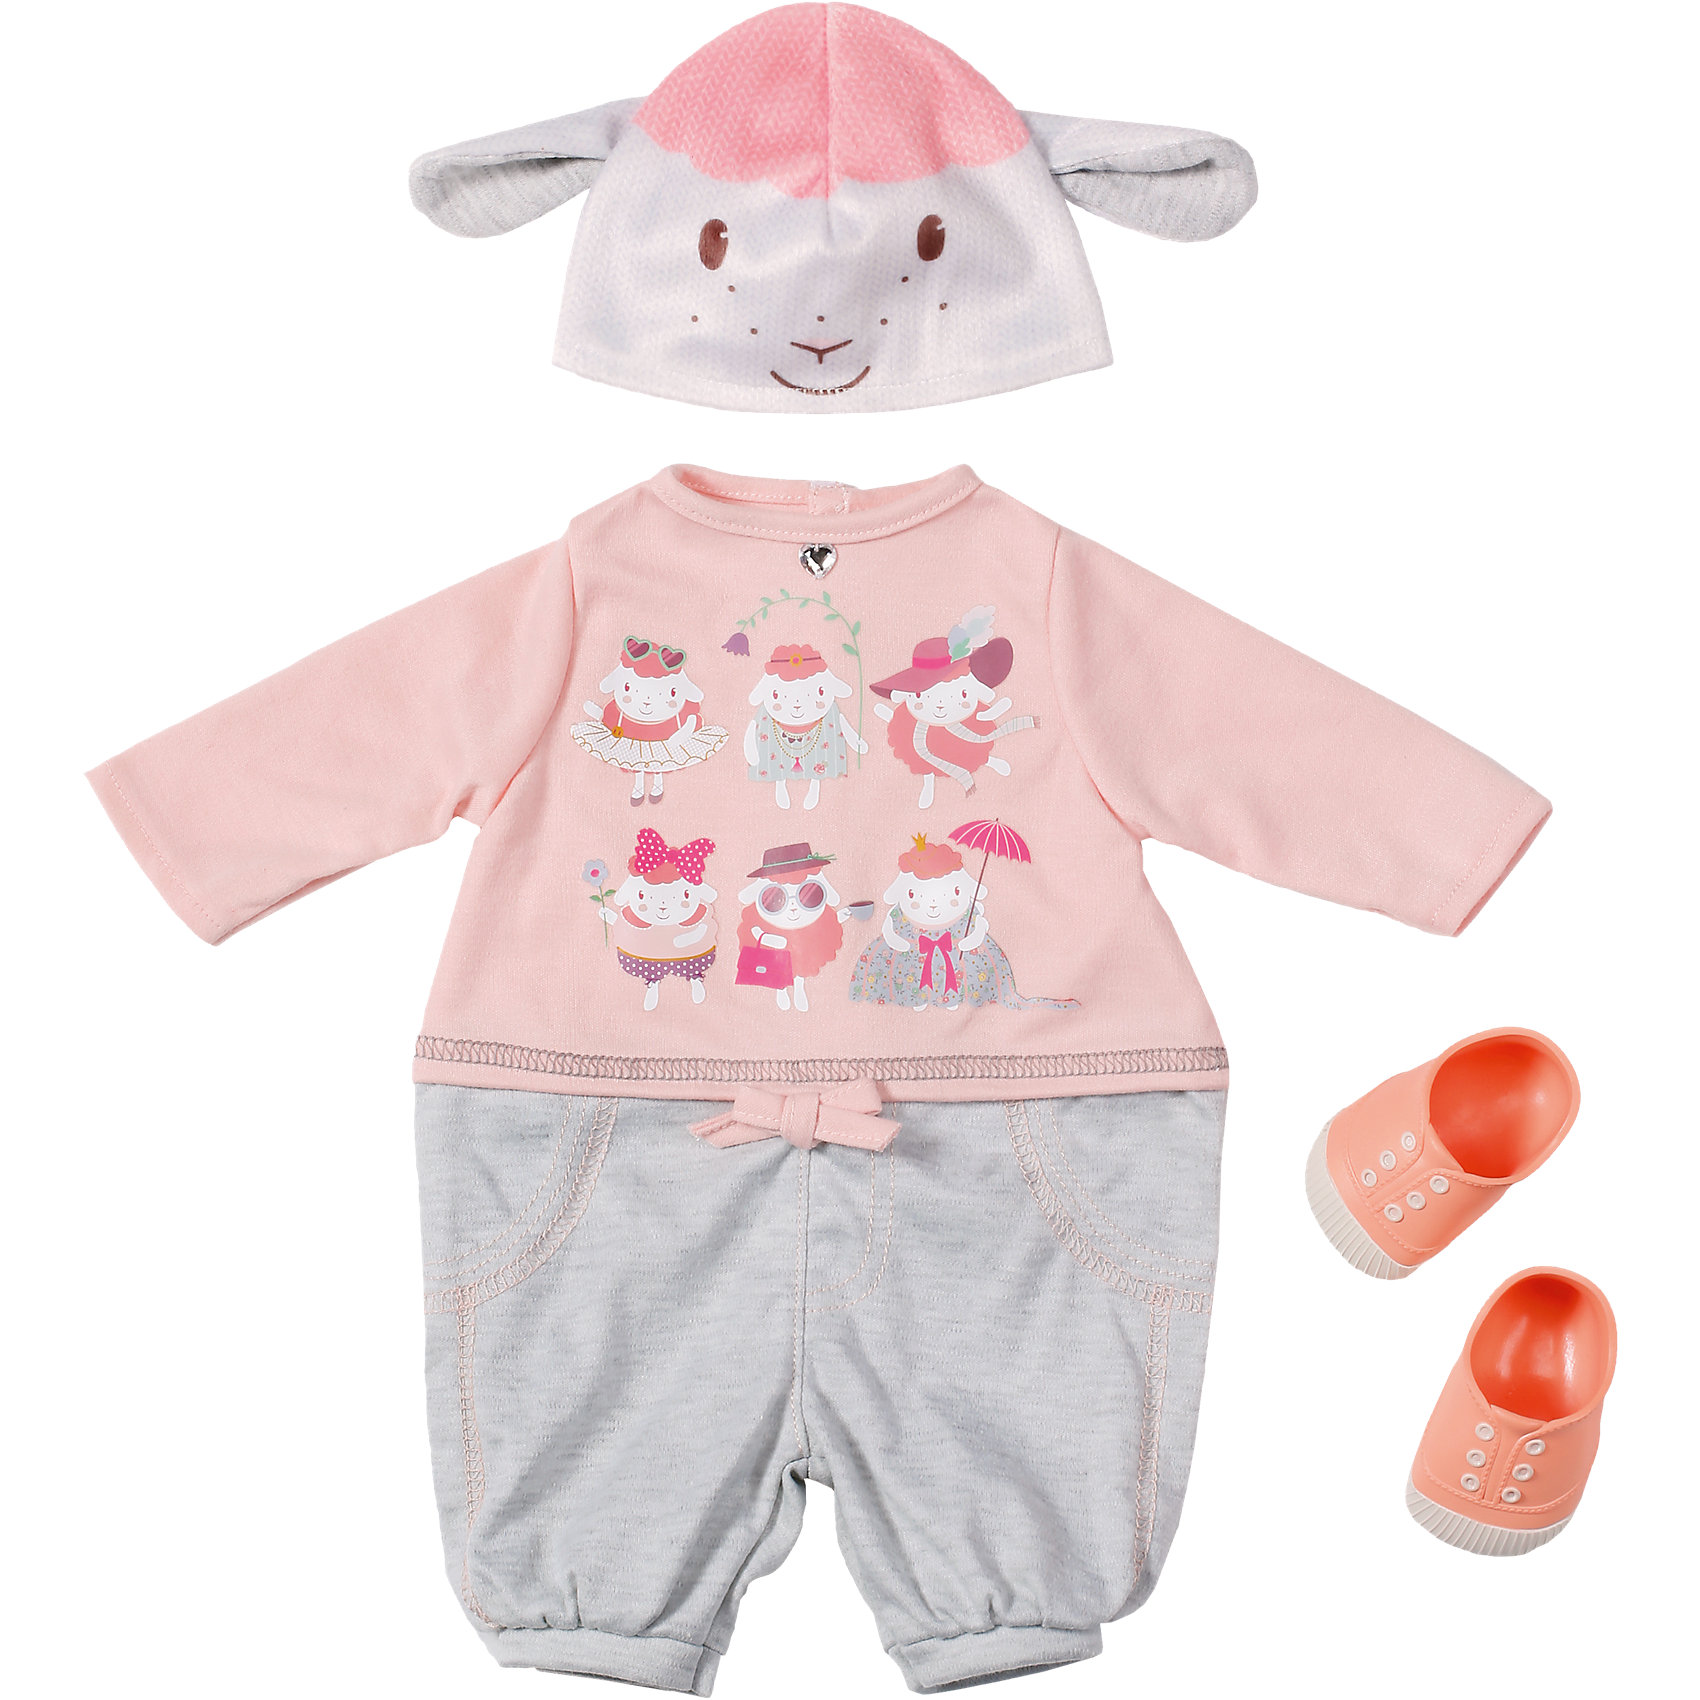 Zapf Creation Одежда для прогулки, Baby Annabell томсон д прогулки по барселоне